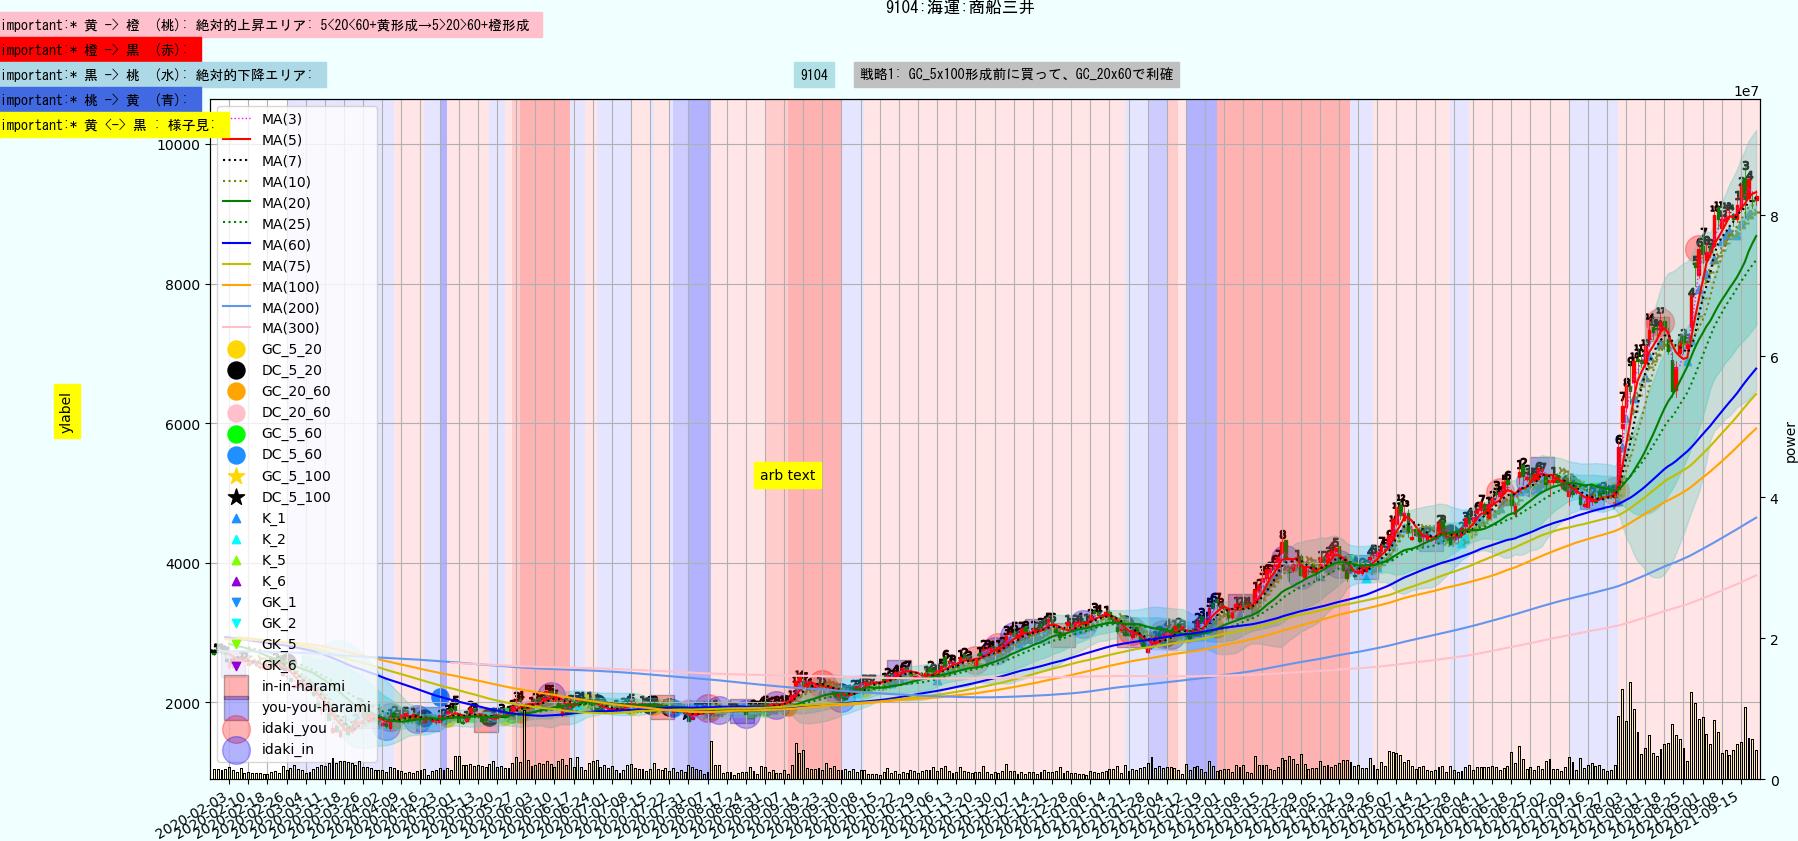 https://trident-capital-strage.s3.ap-northeast-1.amazonaws.com/charts/20210922/9104.png